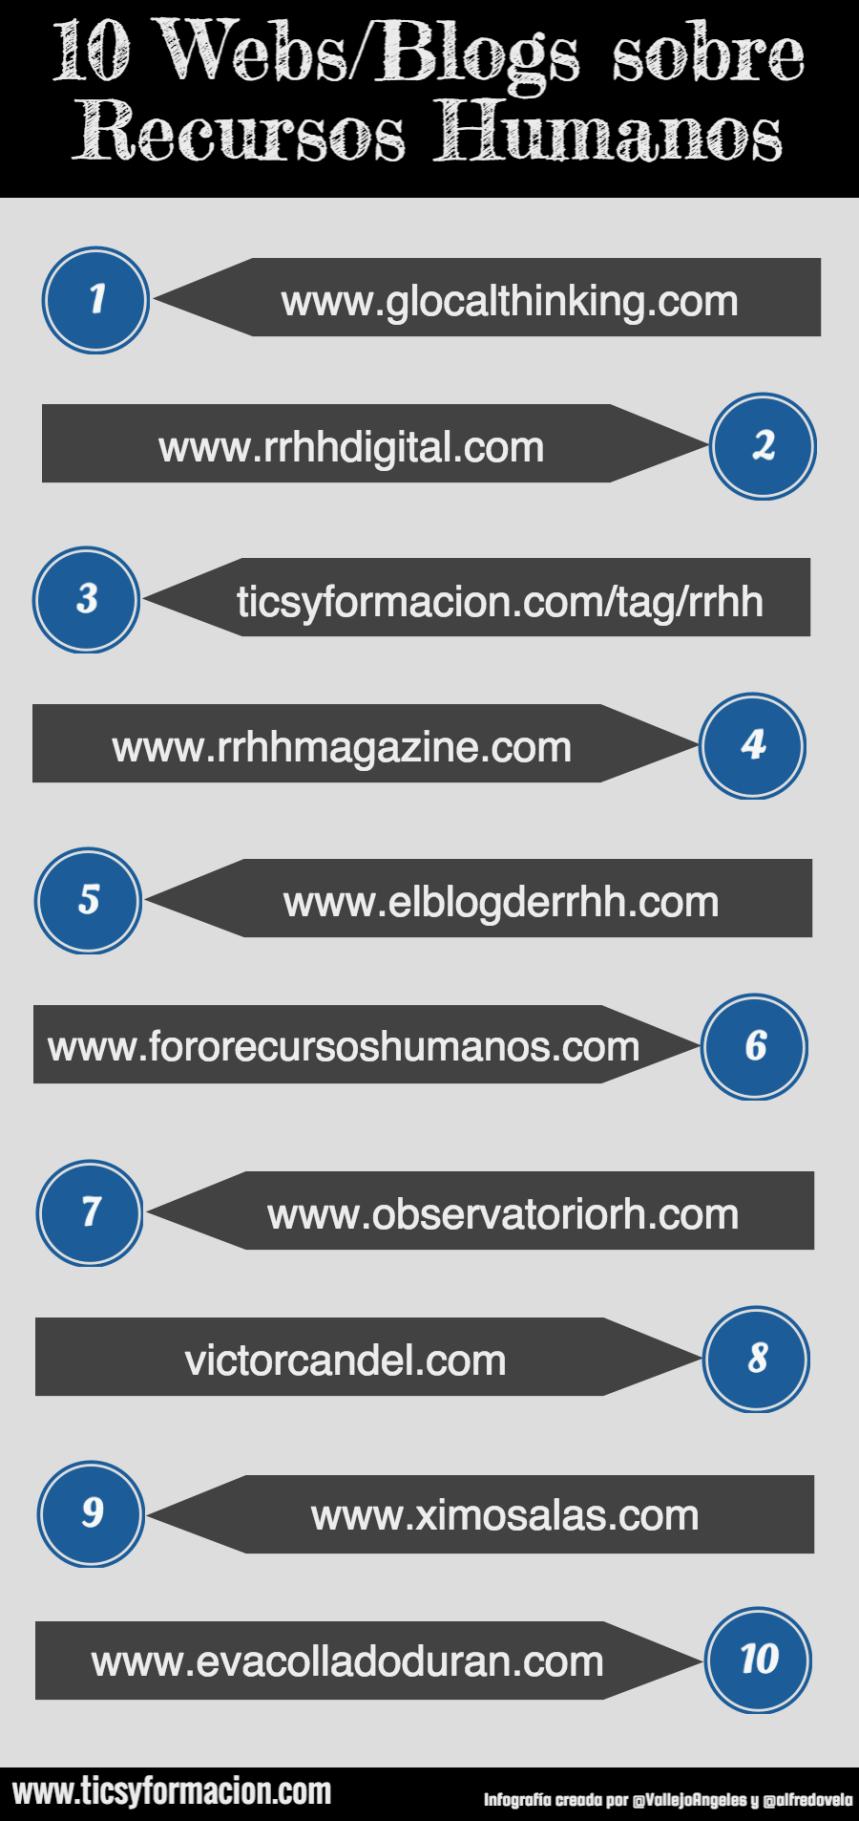 10 Webs/Blogs sobre Recursos Humanos